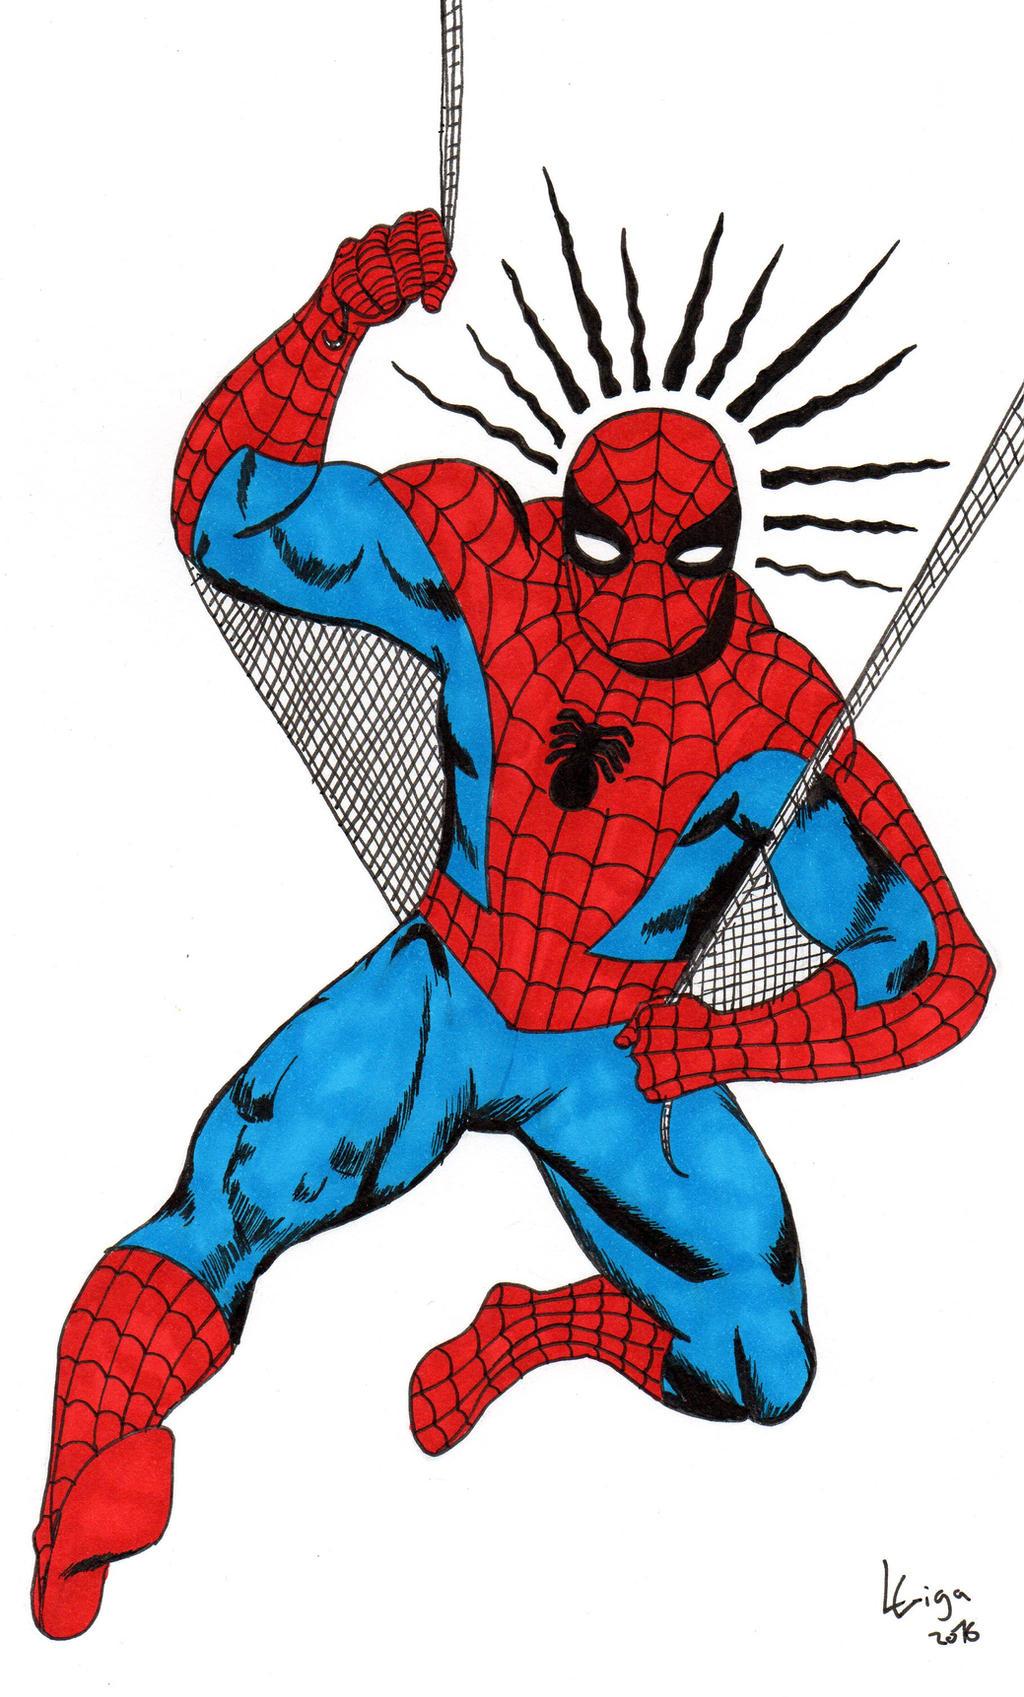 http://img15.deviantart.net/d9e9/i/2016/187/e/e/steve_ditko_s_spider_man_by_clemi1806-da9051m.jpg